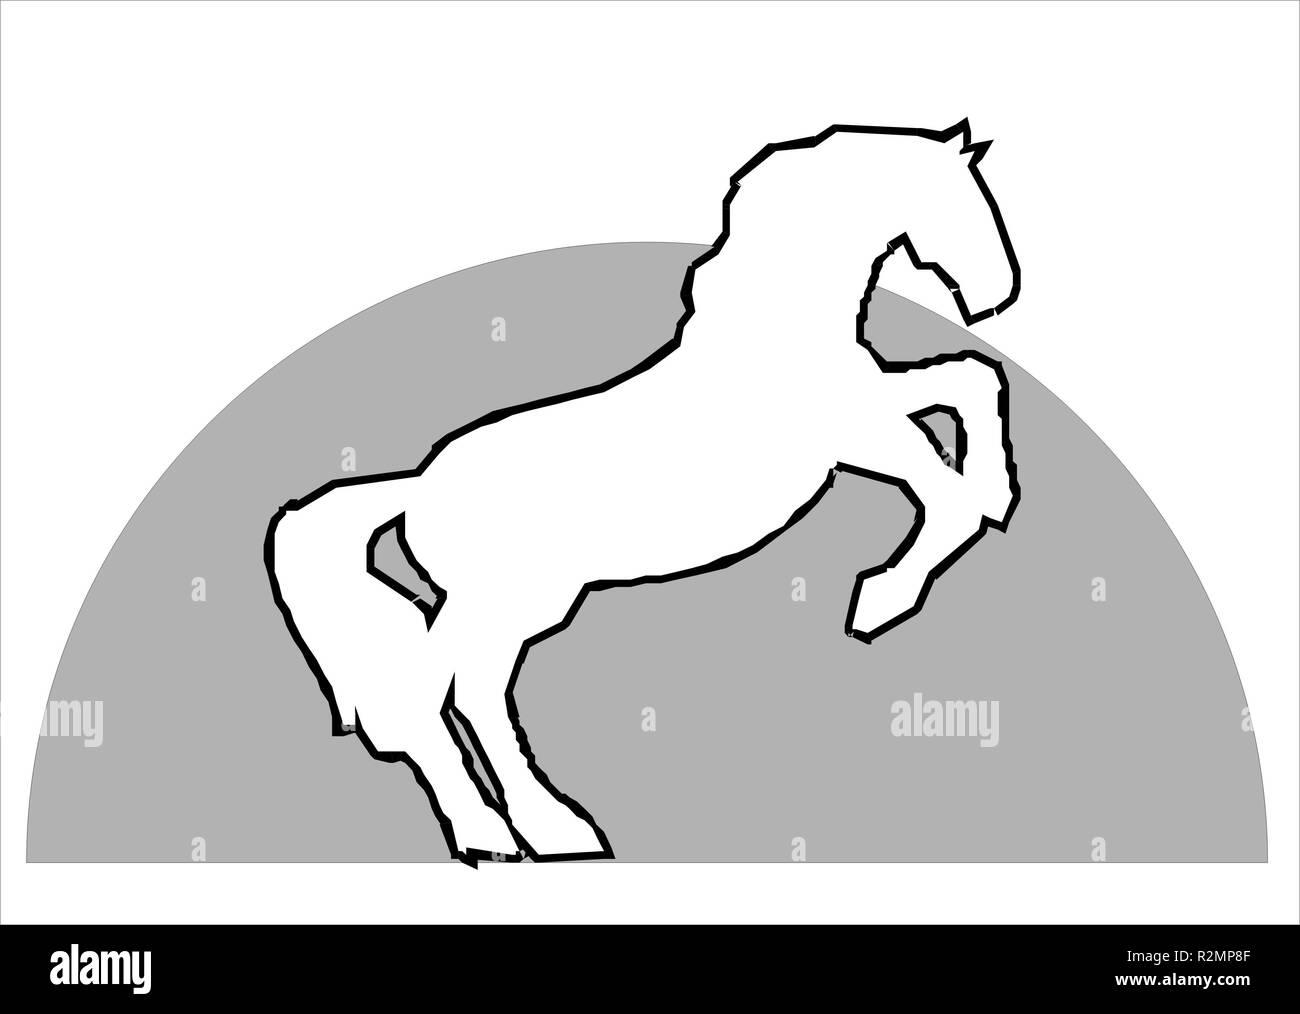 horse 01 Stock Photo